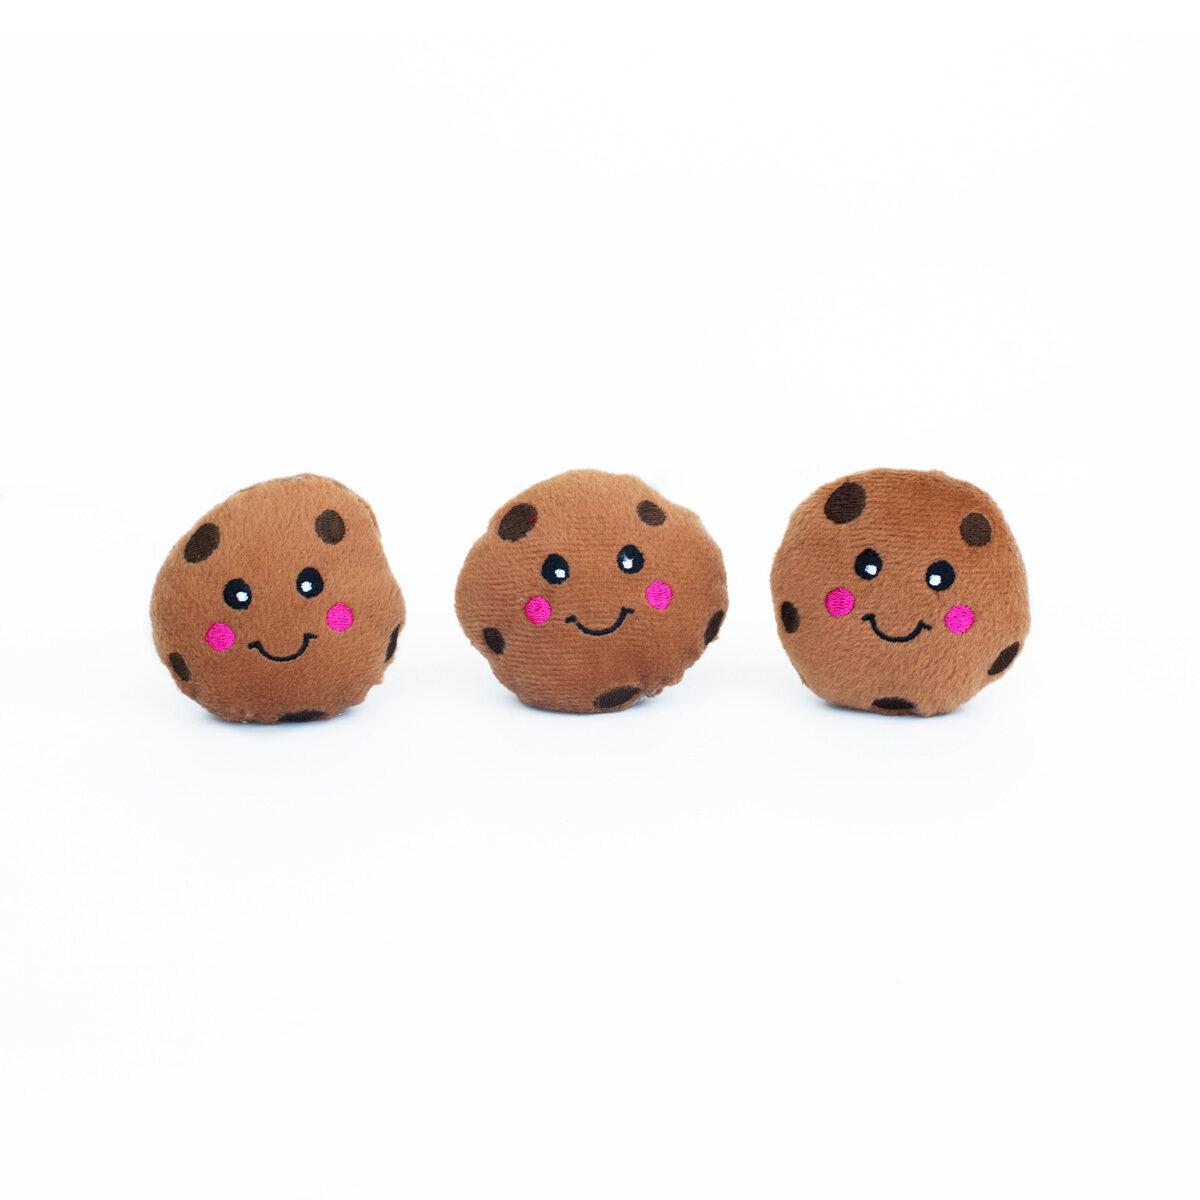 ZippyPaws Burrow - Milk and Cookies Miniz